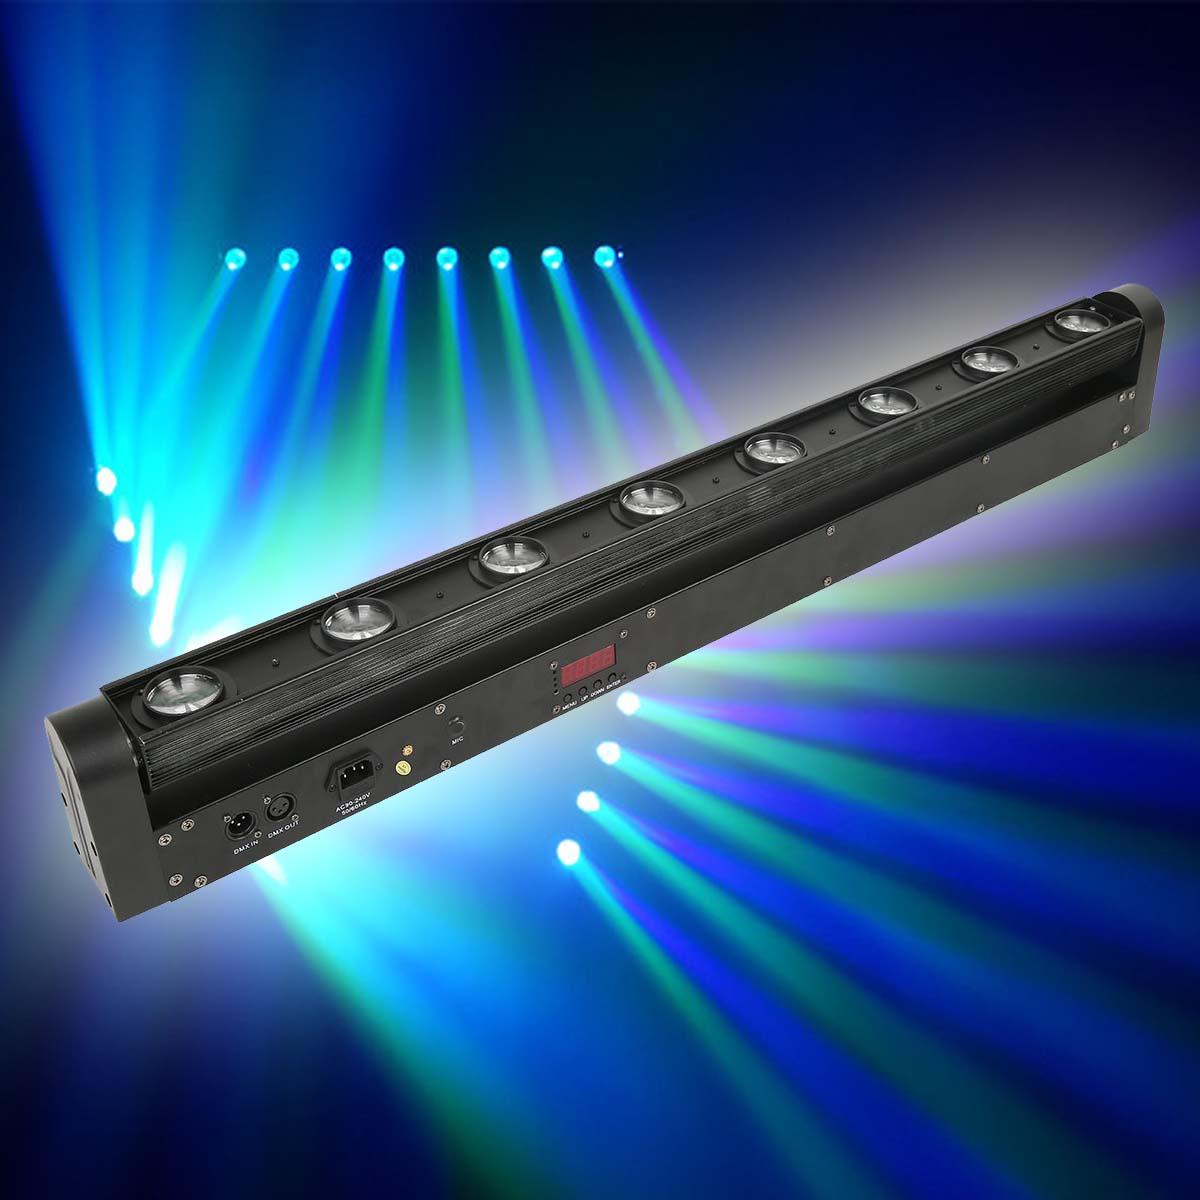 8x12w 100w rgbw 4in1 cree led bar beam moving head light